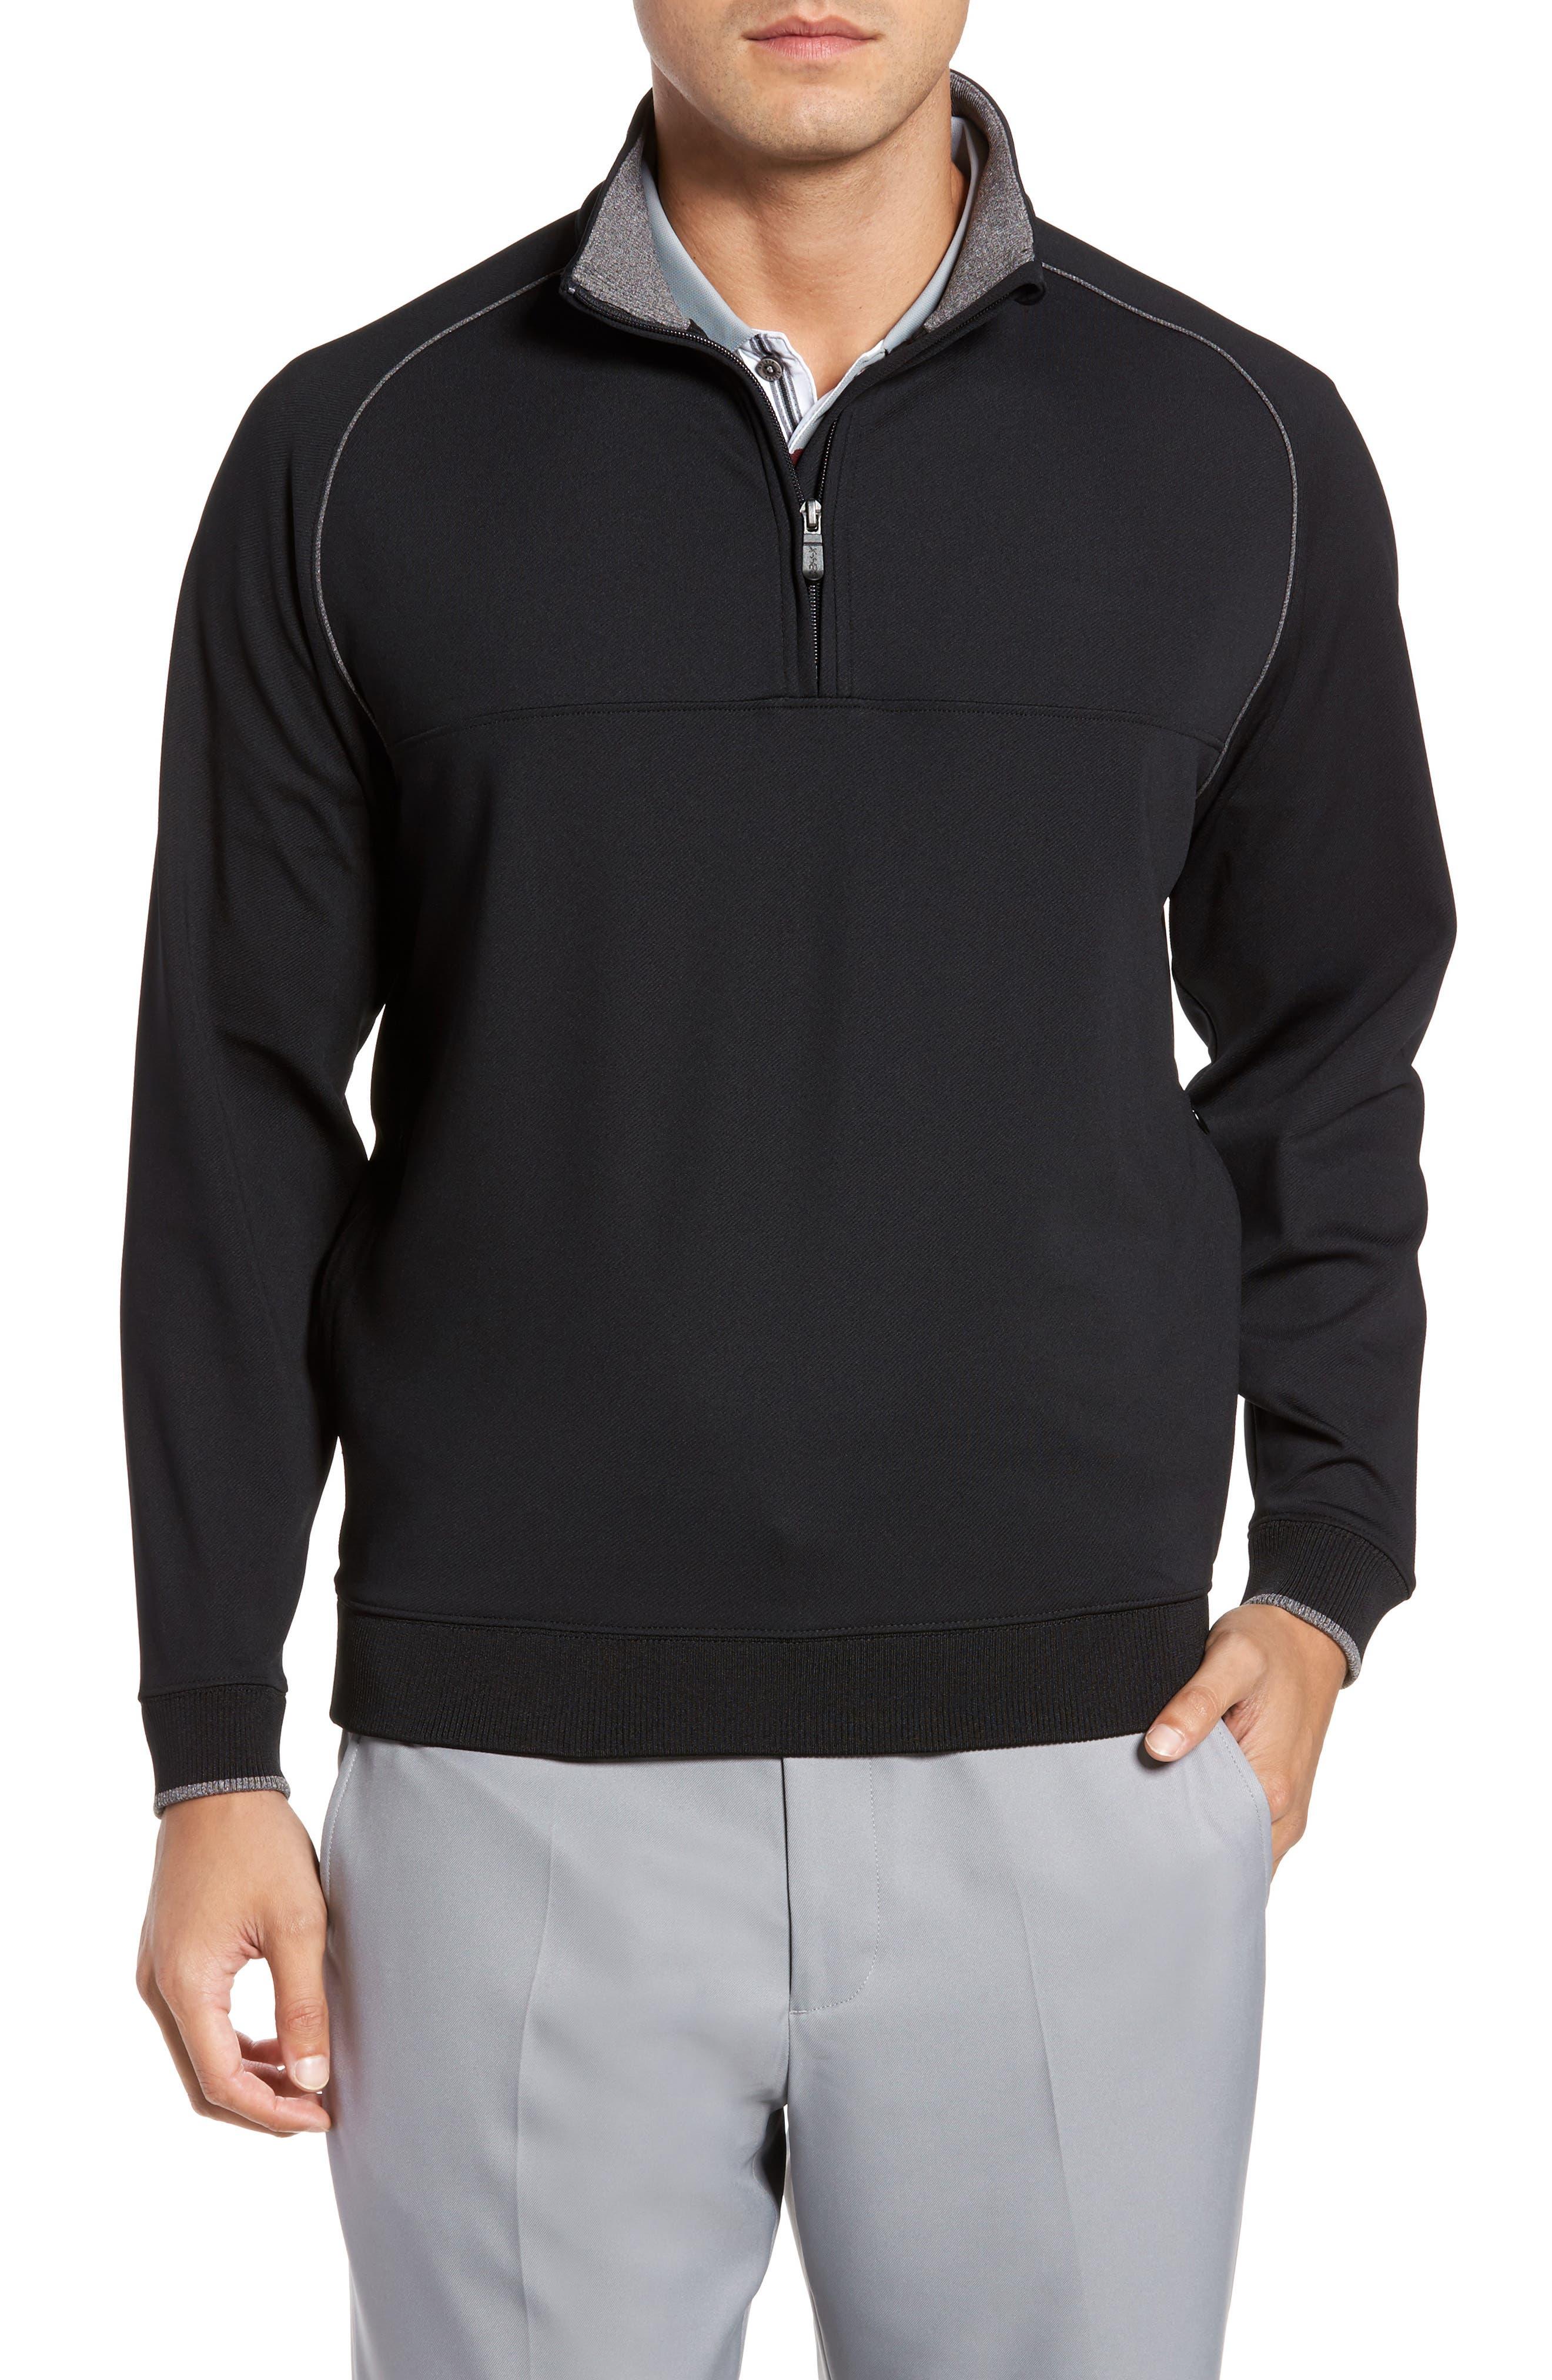 XH20 Banded Bottom Pullover,                             Main thumbnail 1, color,                             001